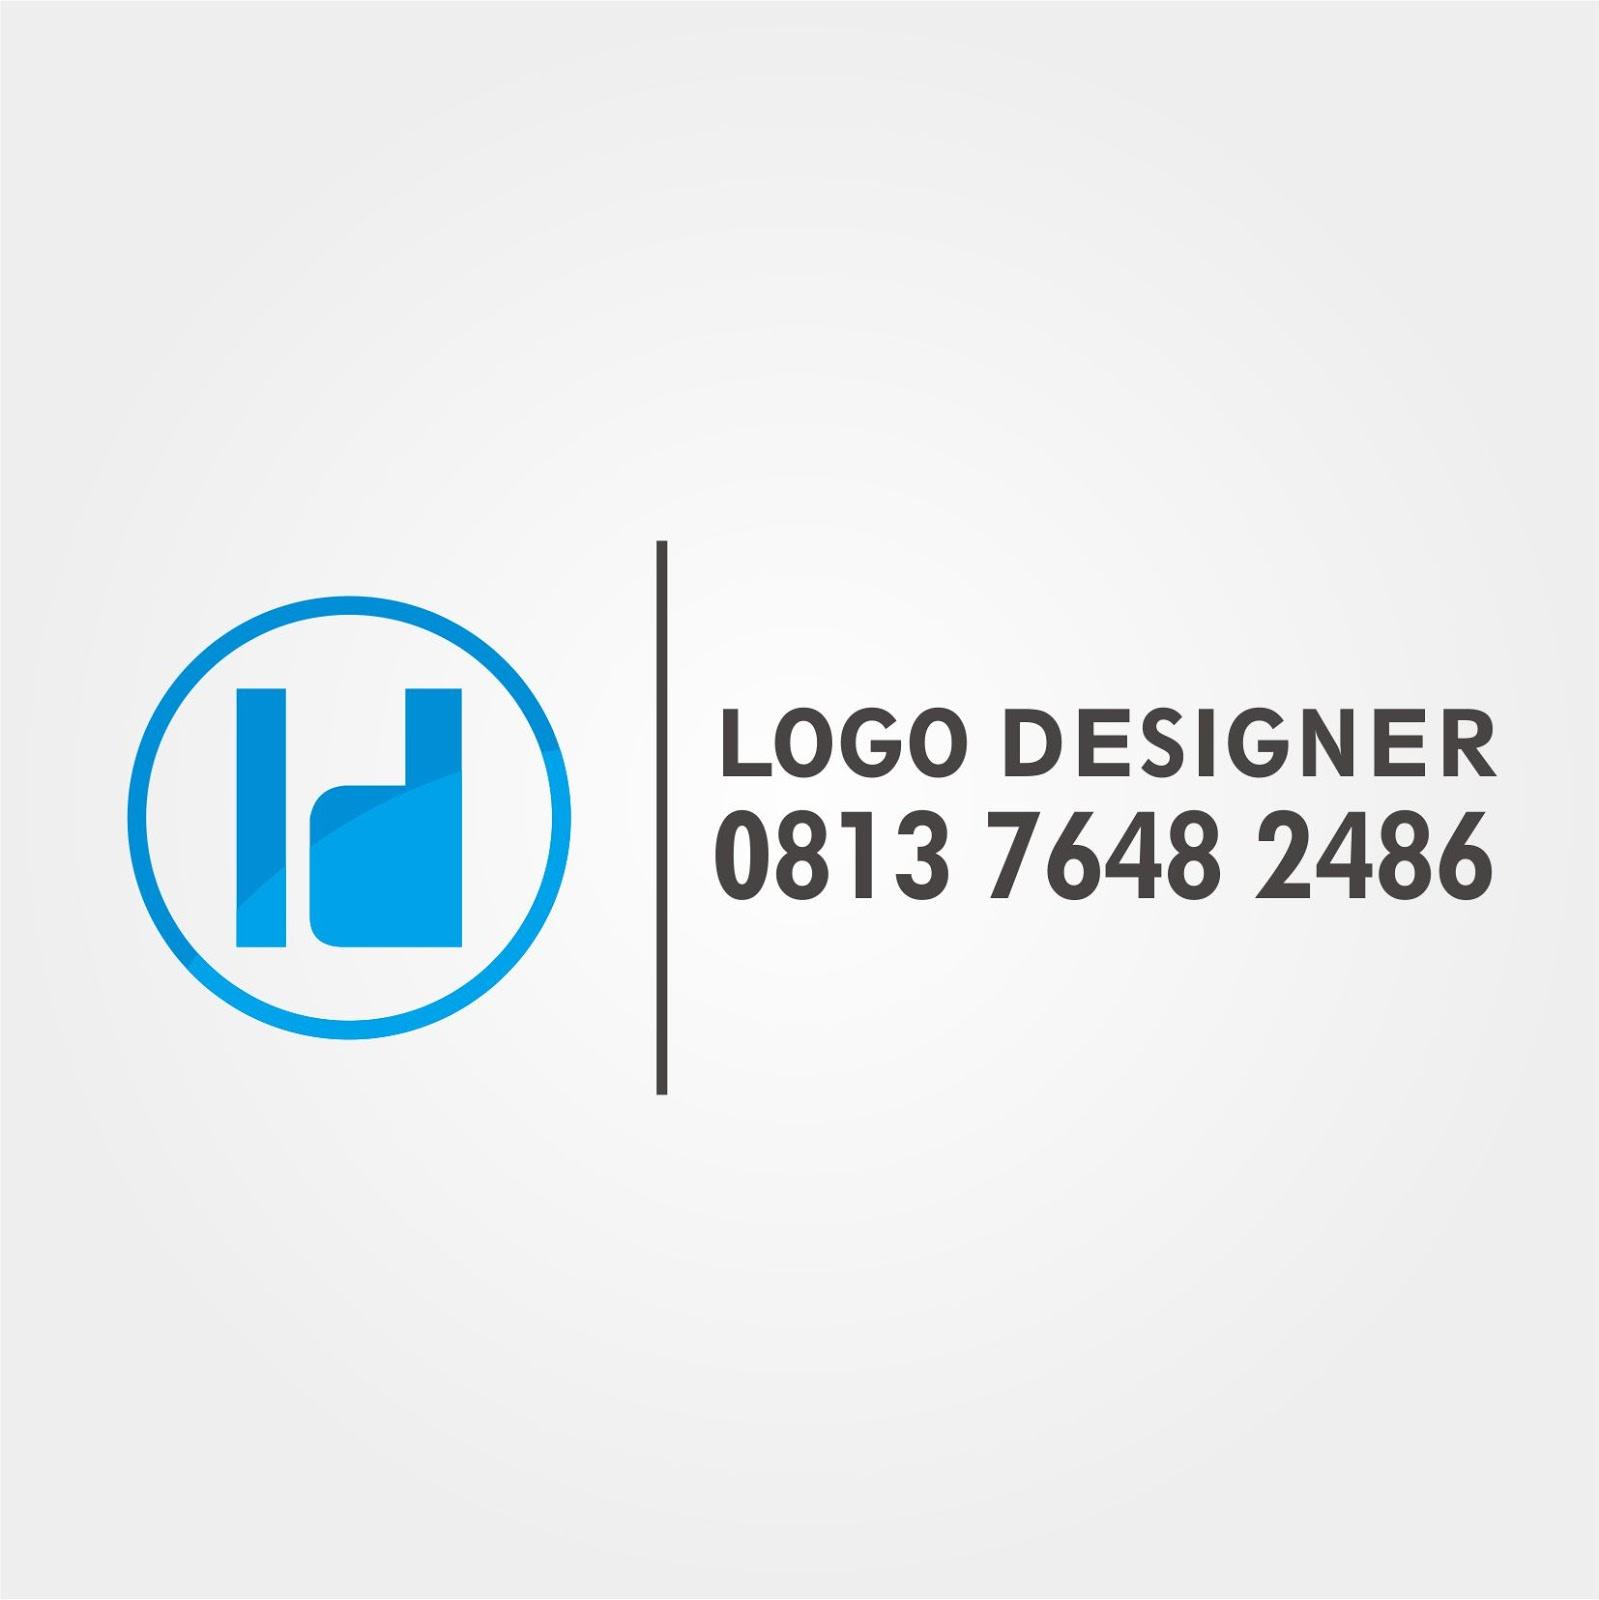 jasa buat desain logo murah di medan